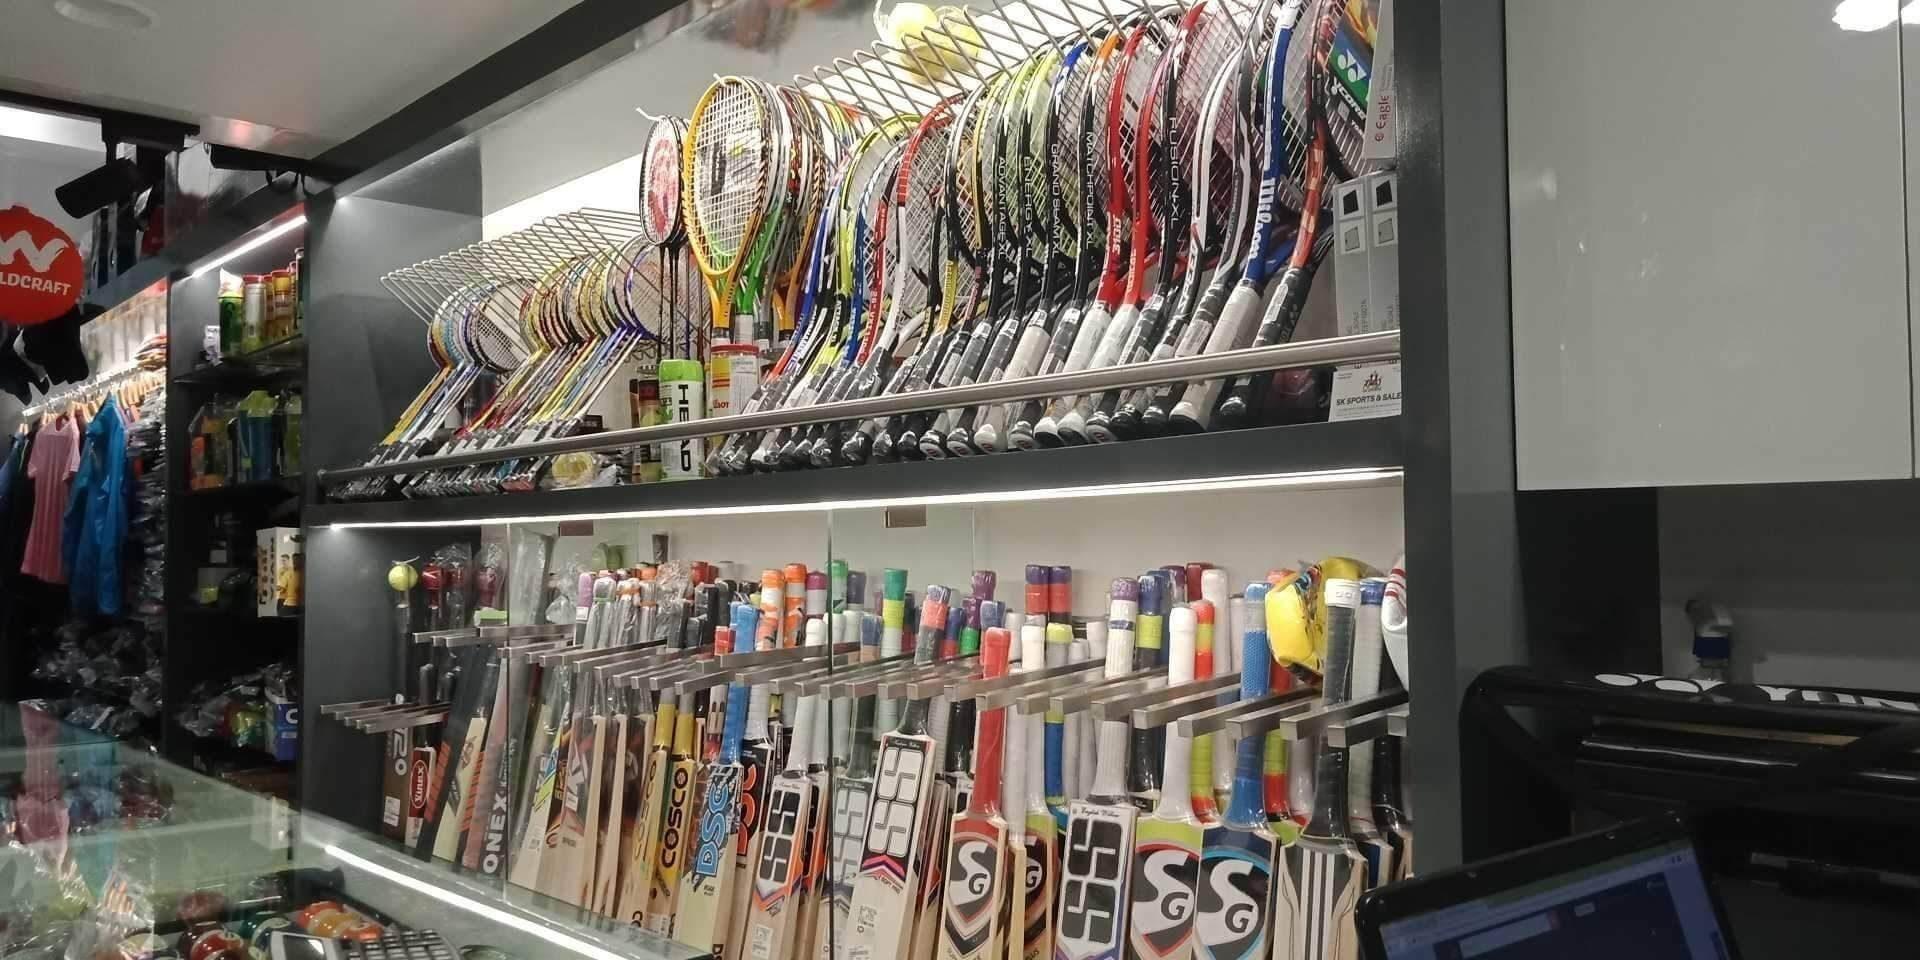 SK-Sports-Goods-Store-cricket-badminton-bats Sports Goods Store / Shop in Pimple Saudagar – SK Sports and Sales | sports goods store / shop in pimple saudagar